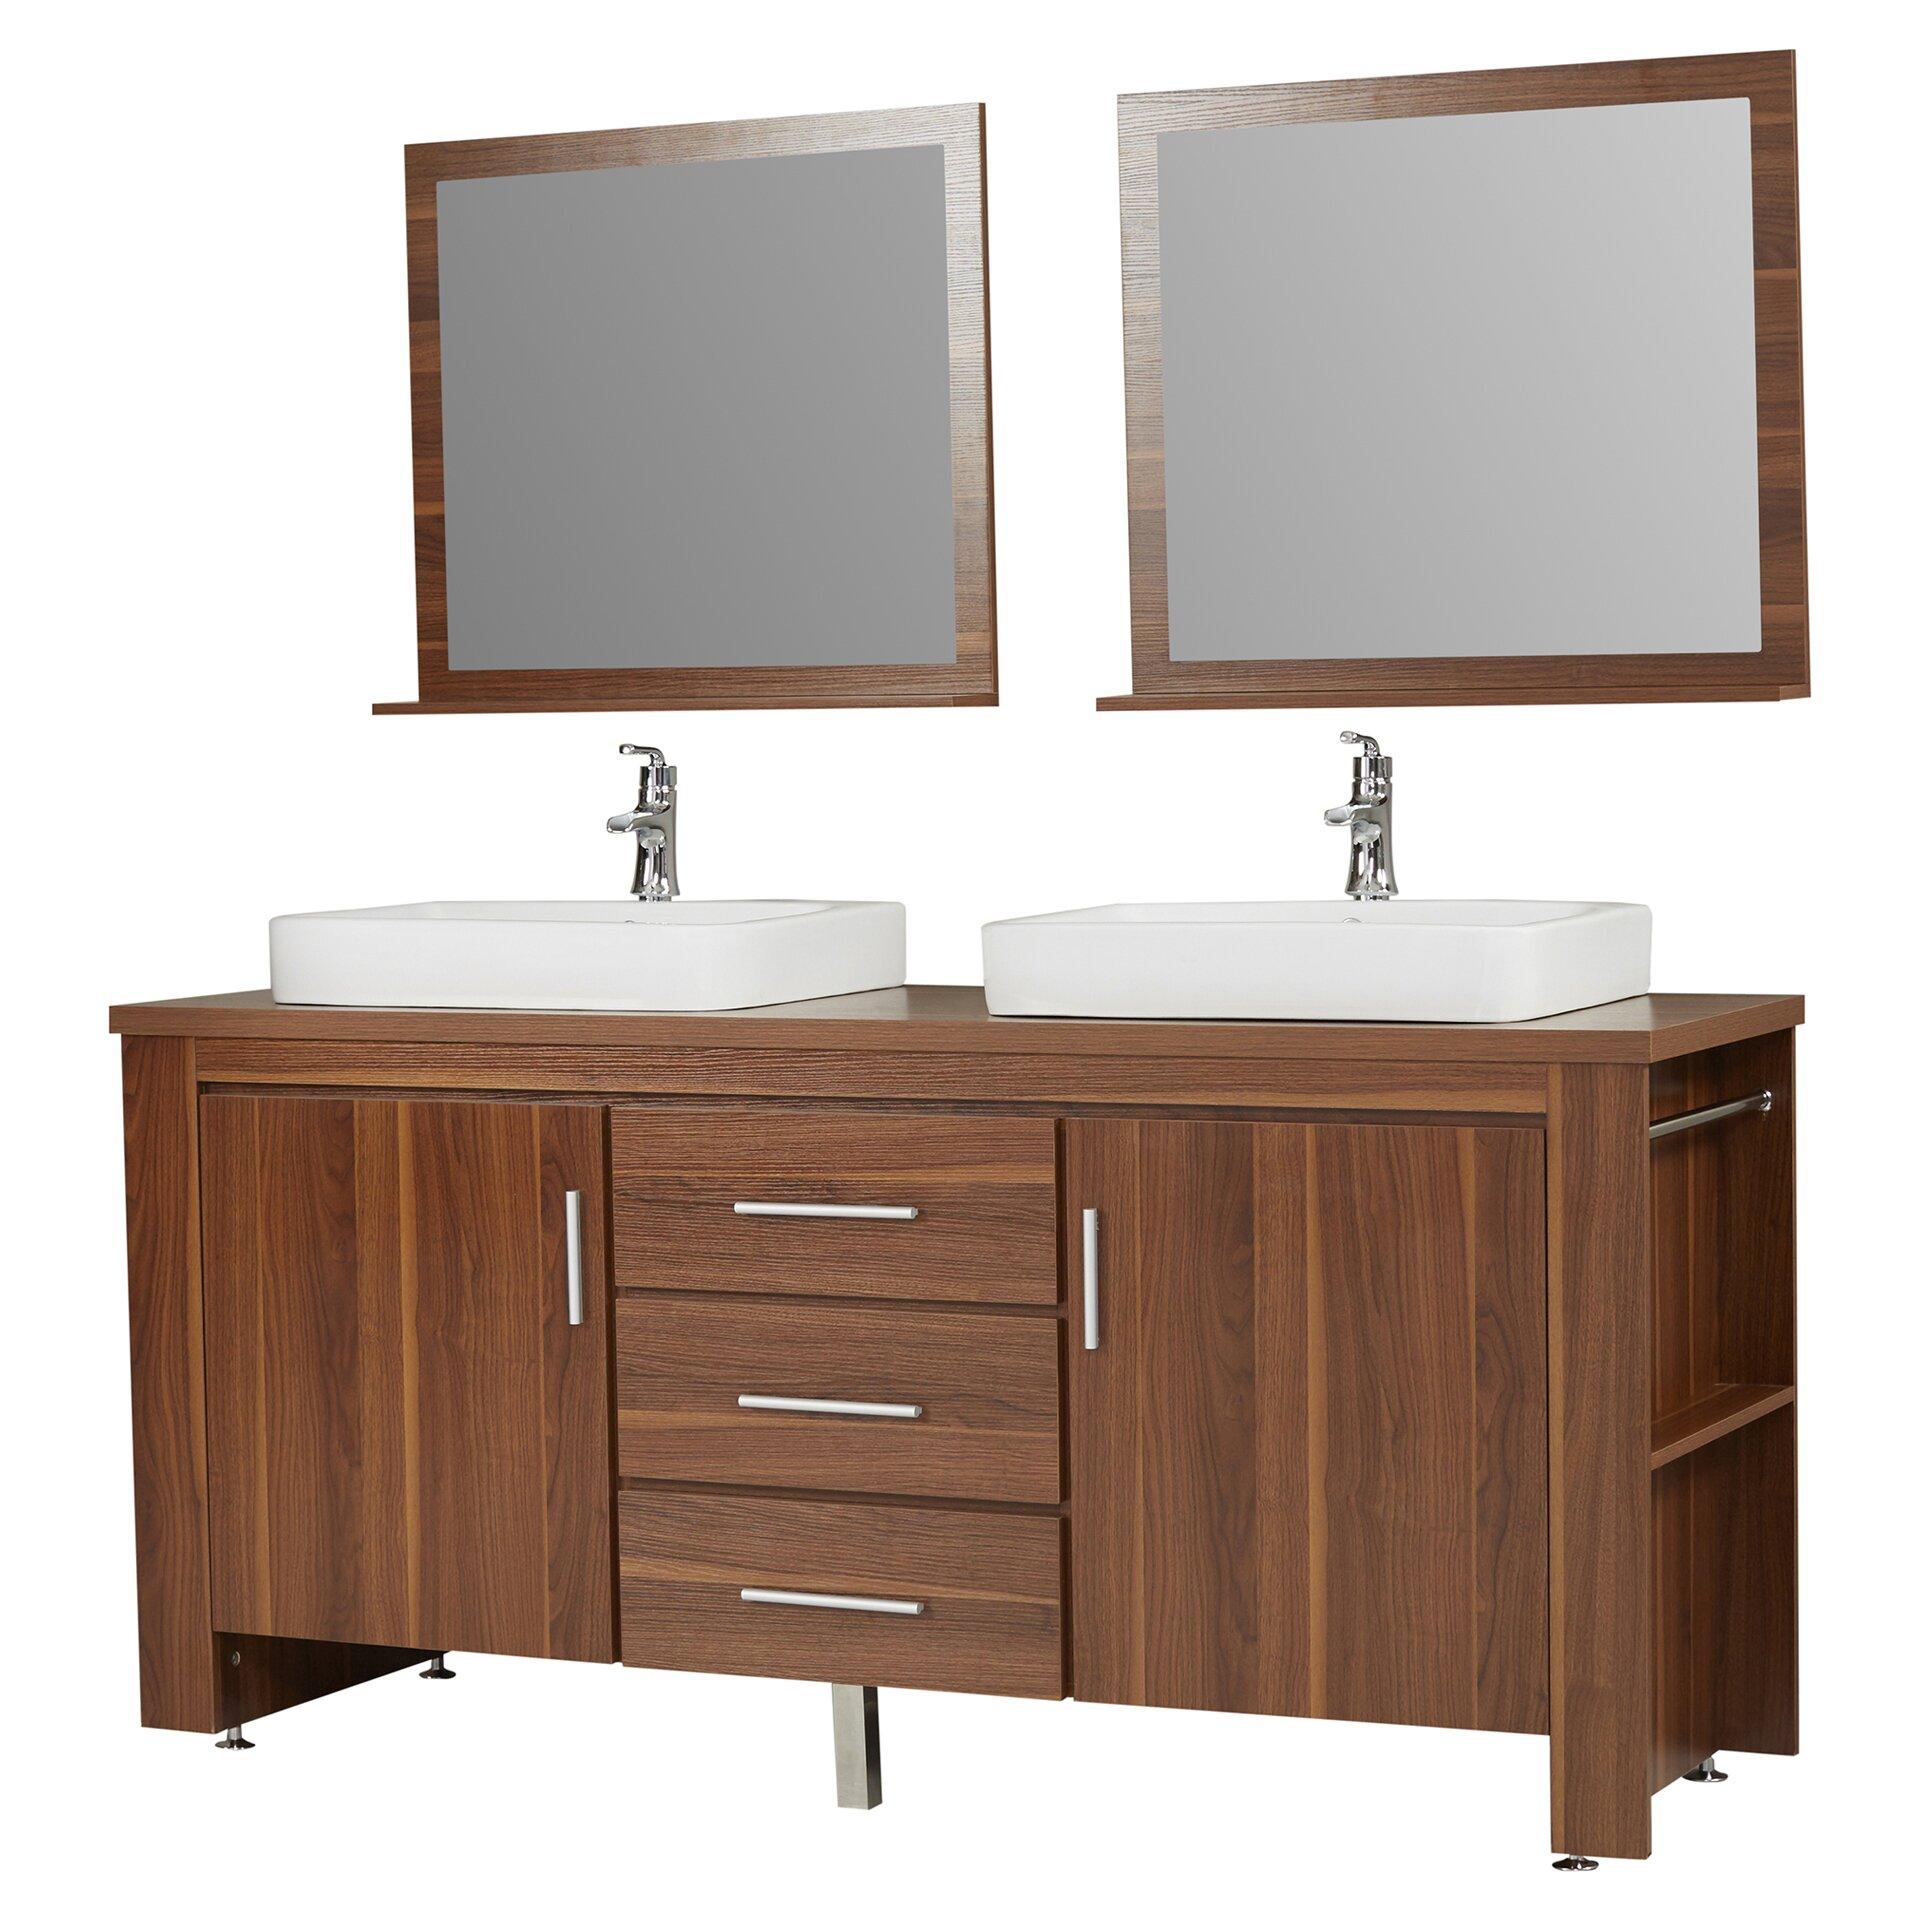 Wade logan parsons 72 double bathroom vanity set with for Bathroom mirror set